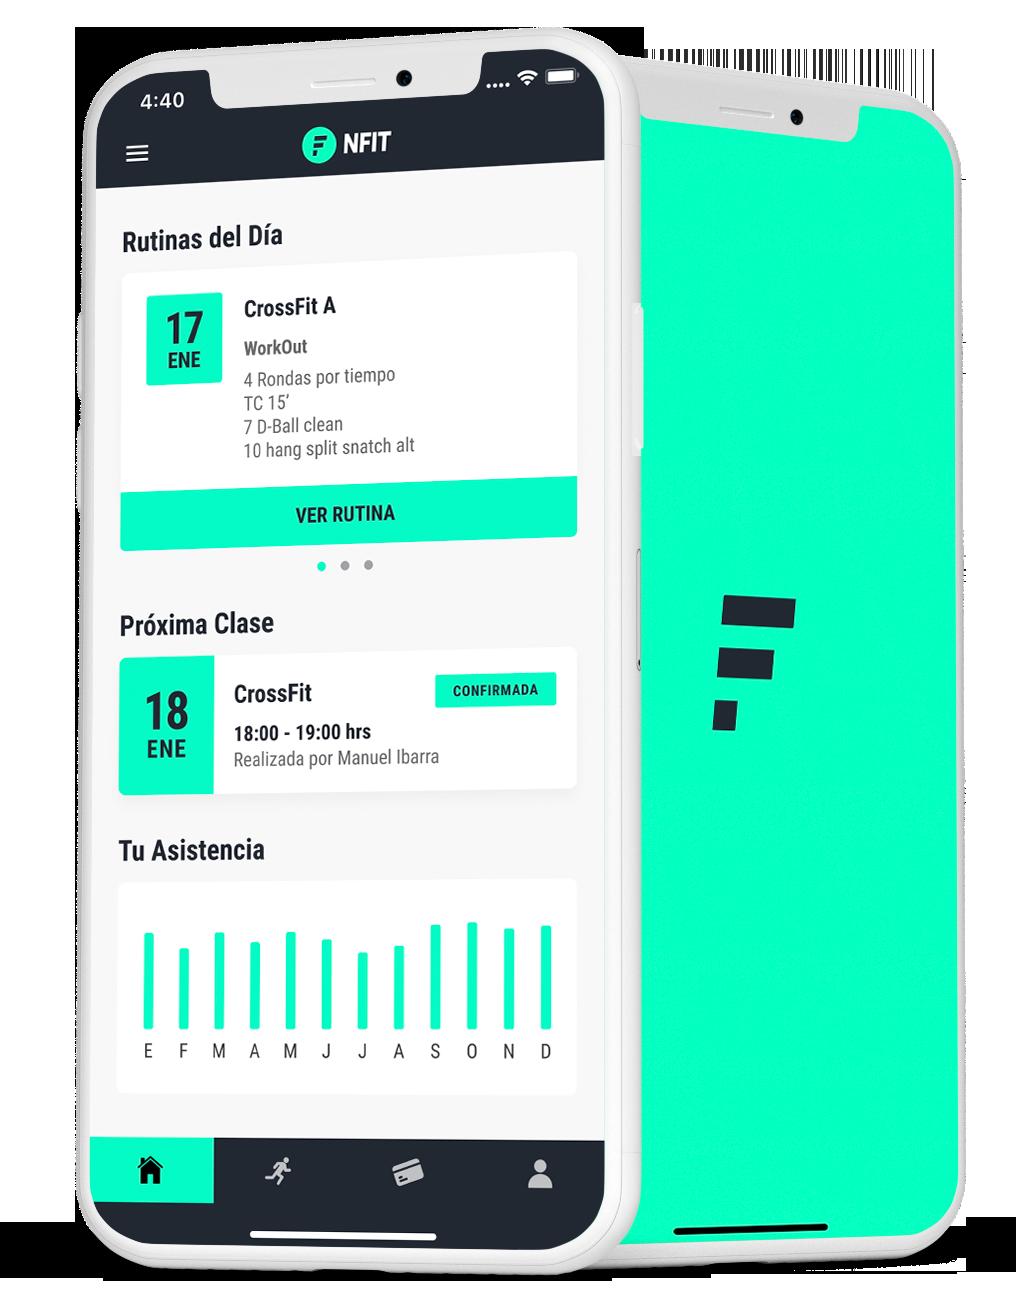 Vista referencial de la App de NFIT